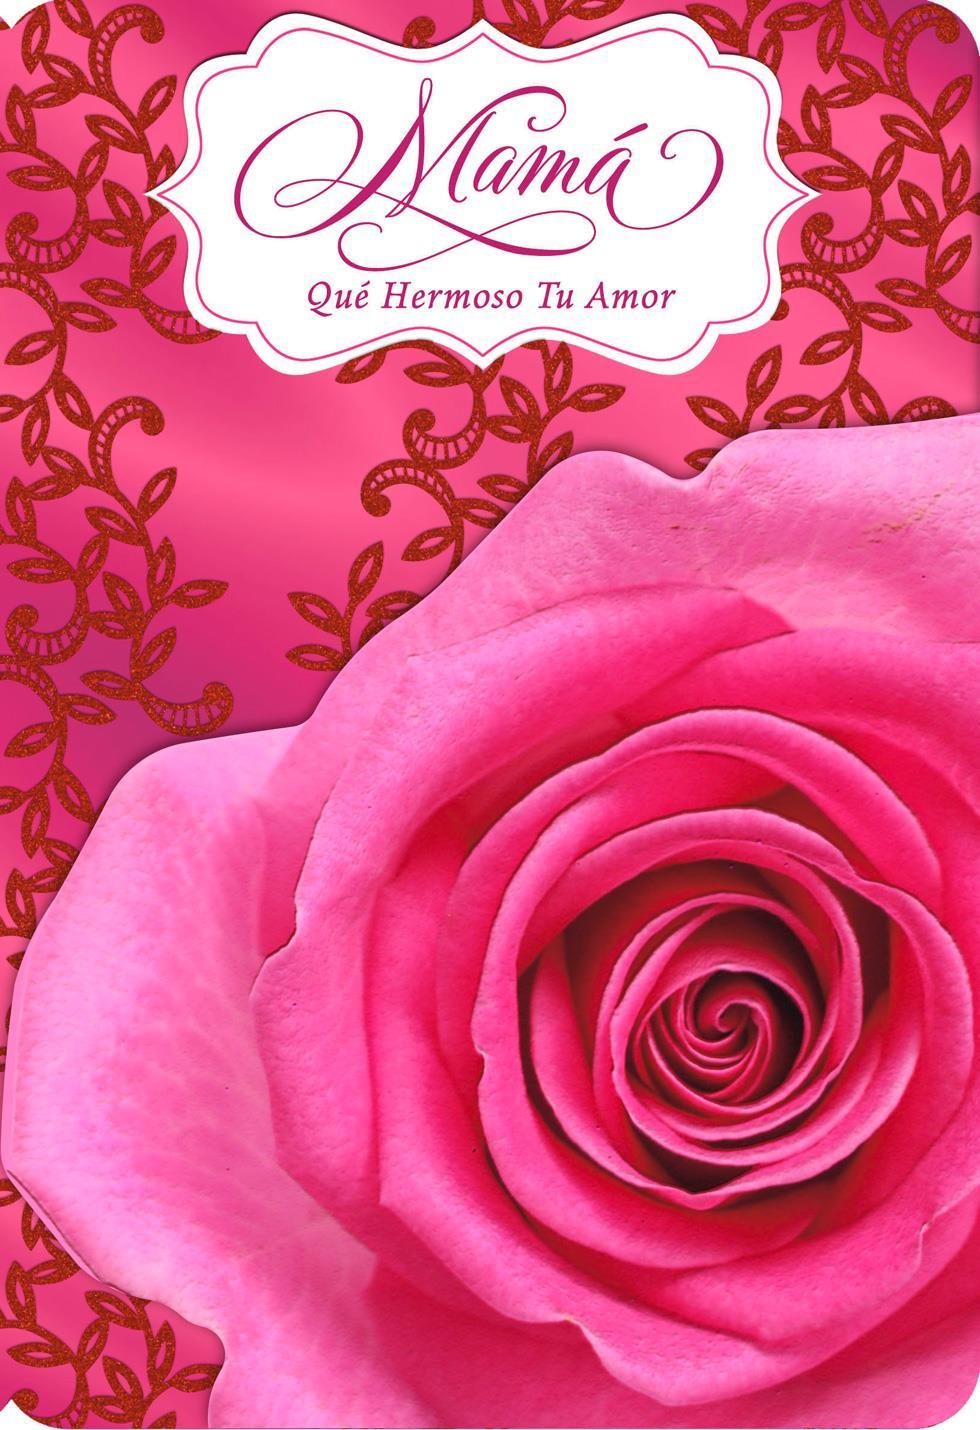 All my heart spanish language valentines day card for mom all my heart spanish language valentines day card for mom m4hsunfo